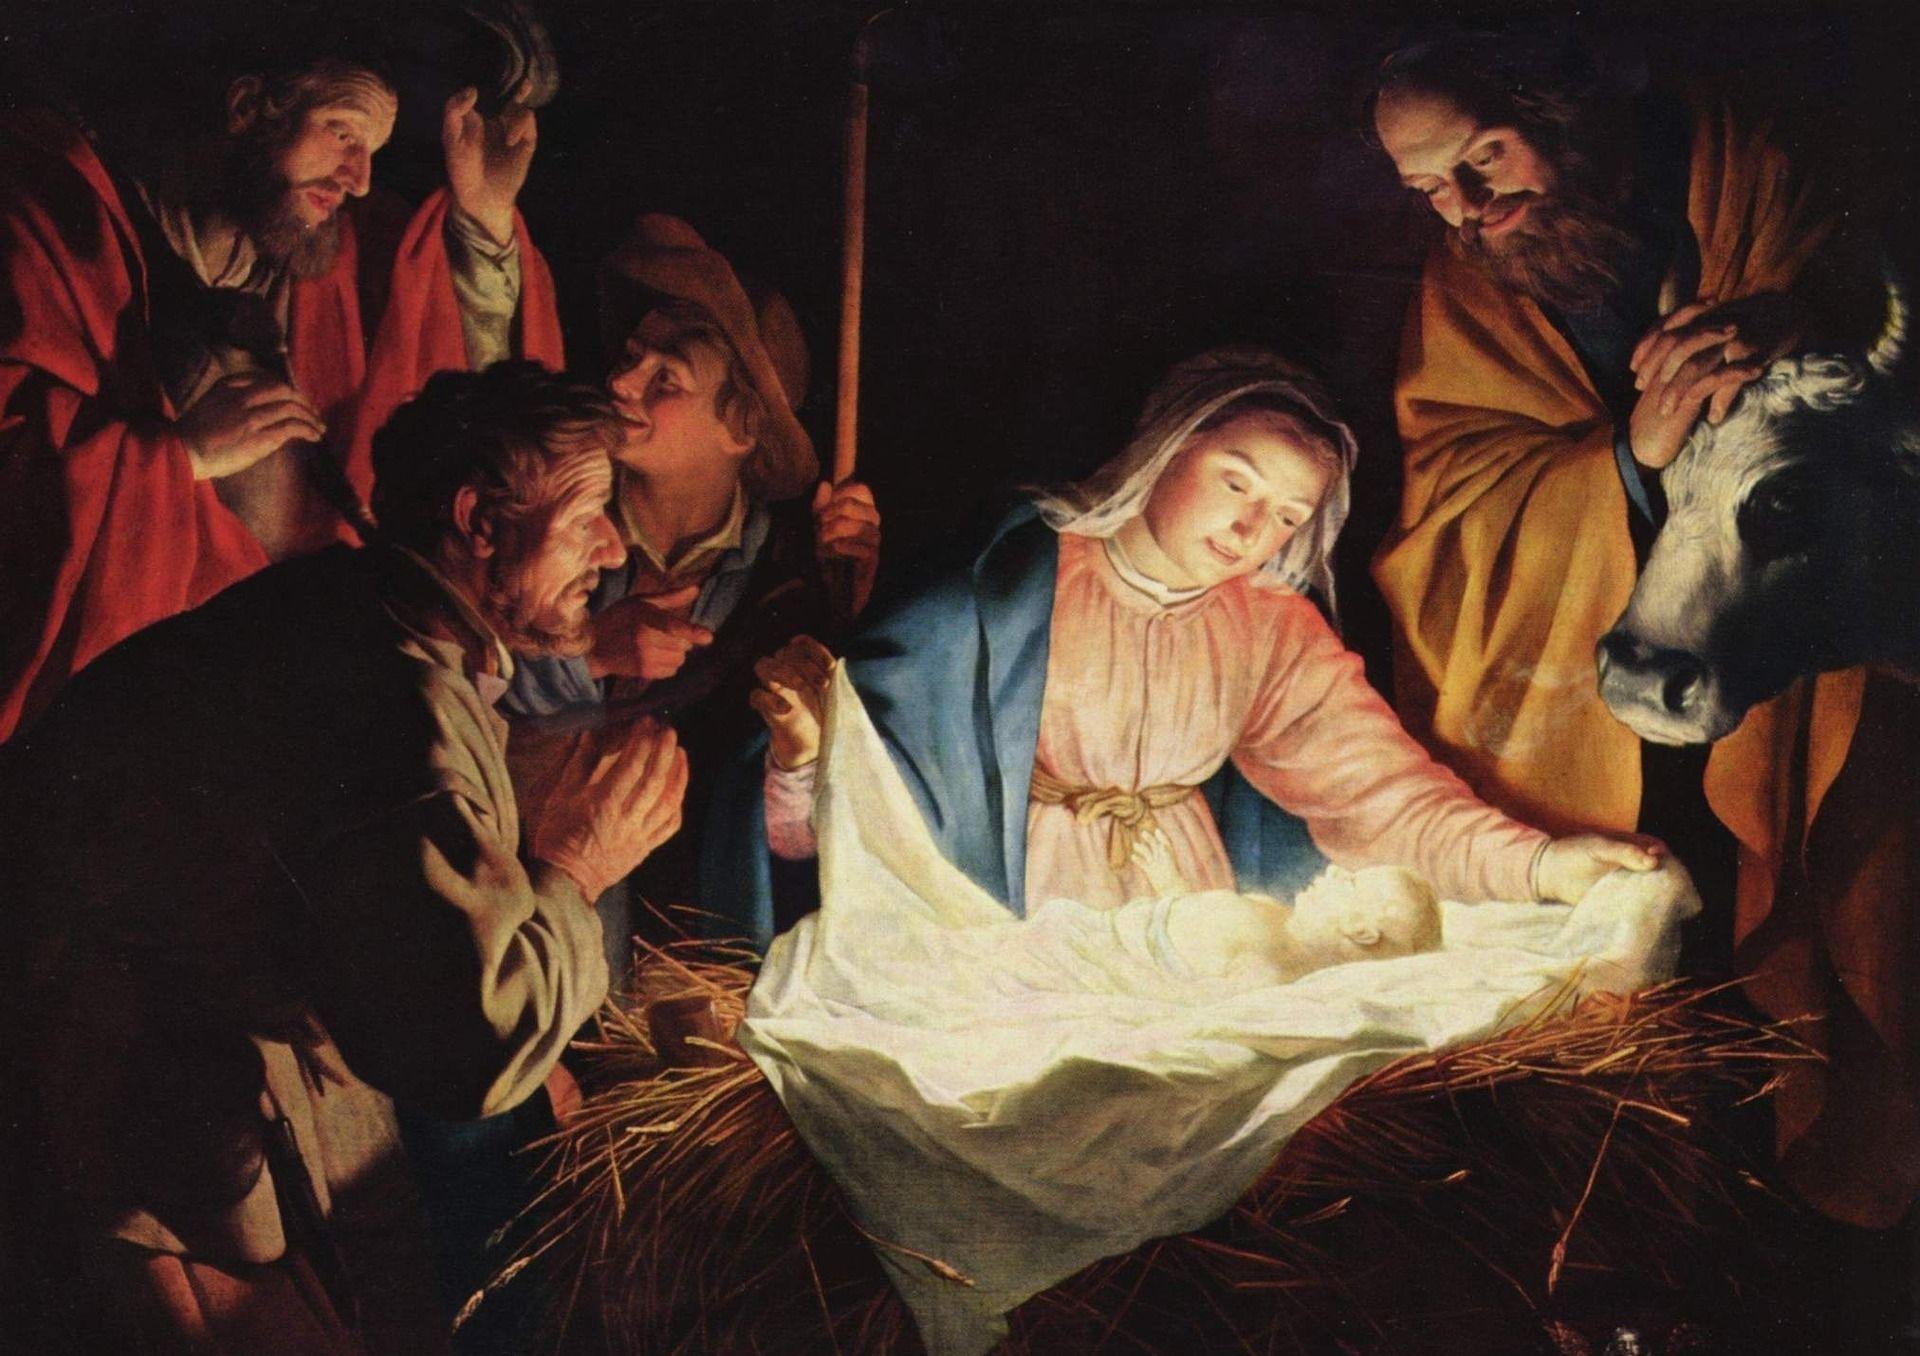 Kršćani slave Božić – blagdan rođenja Isusa Krista